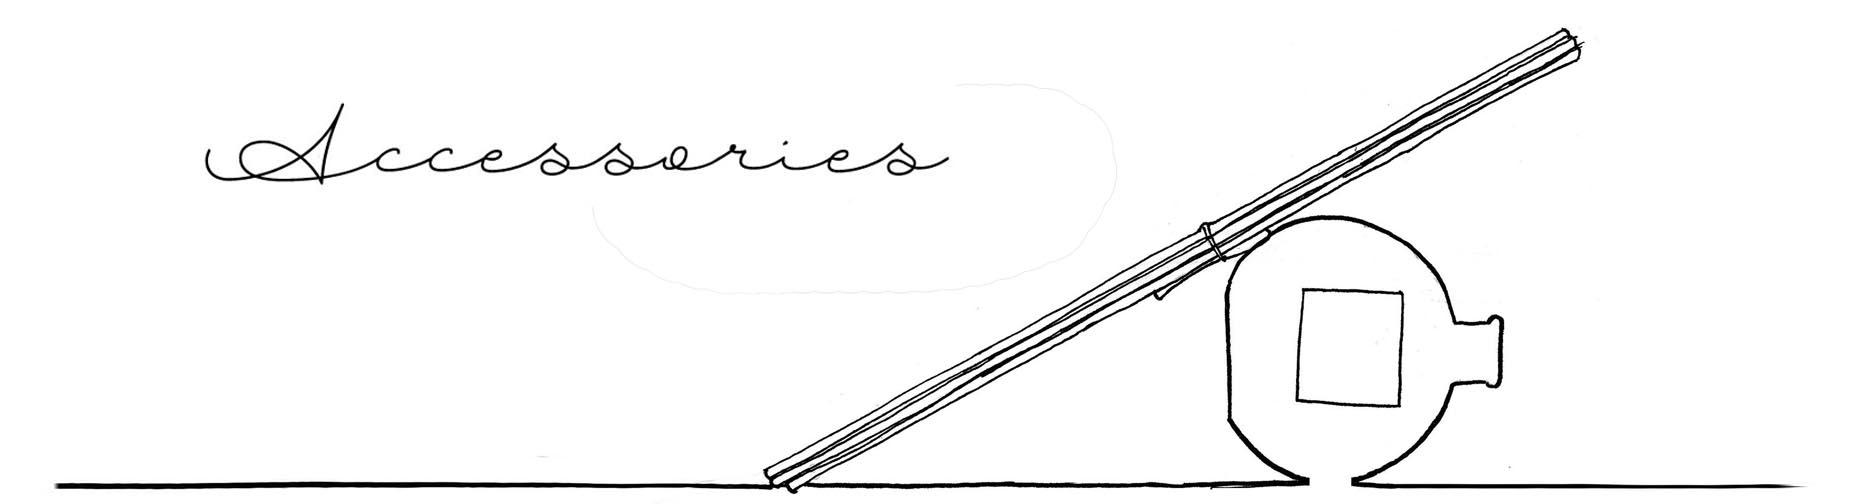 accessories-long-banner.jpg